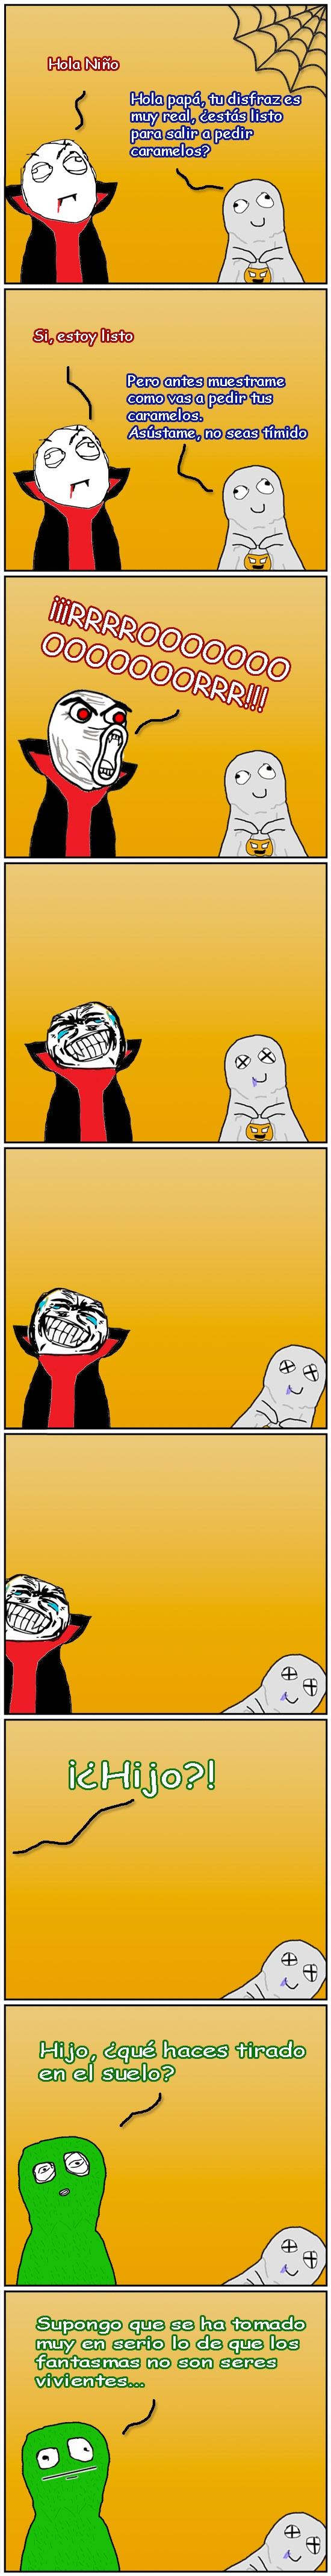 Pokerface - Padres trolls en Halloween